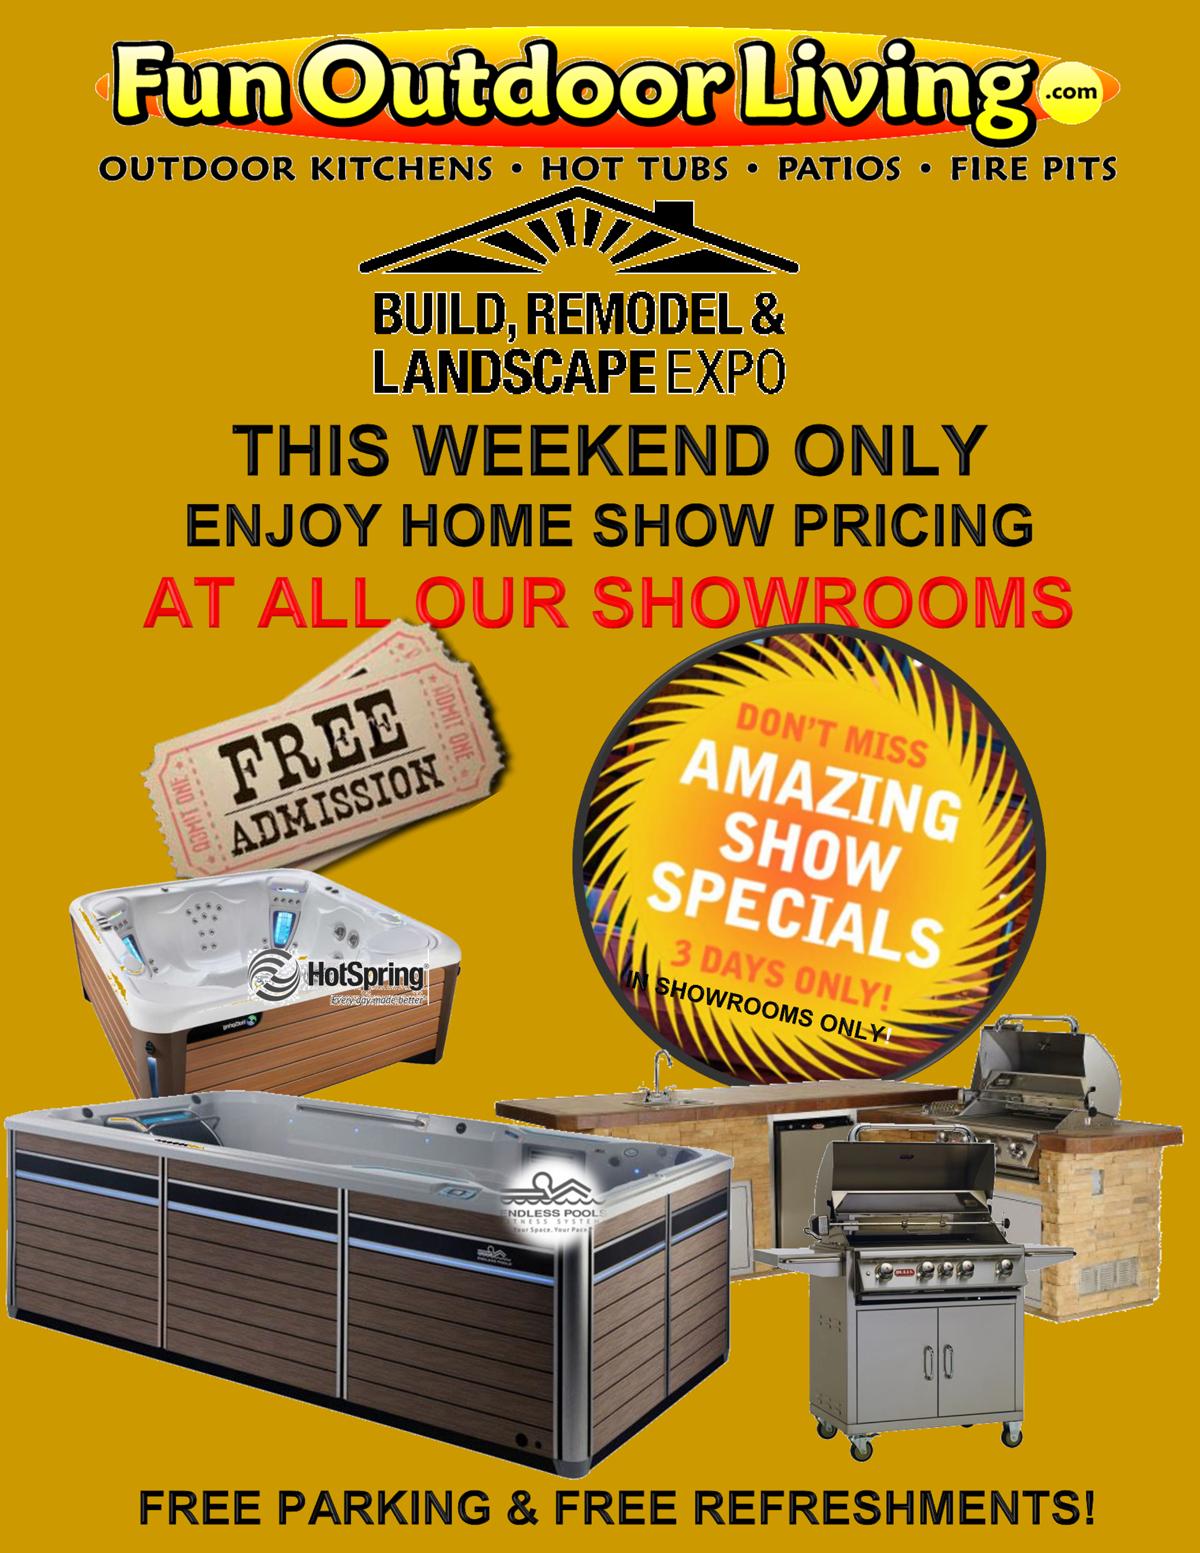 Amazing Showroom Specials!